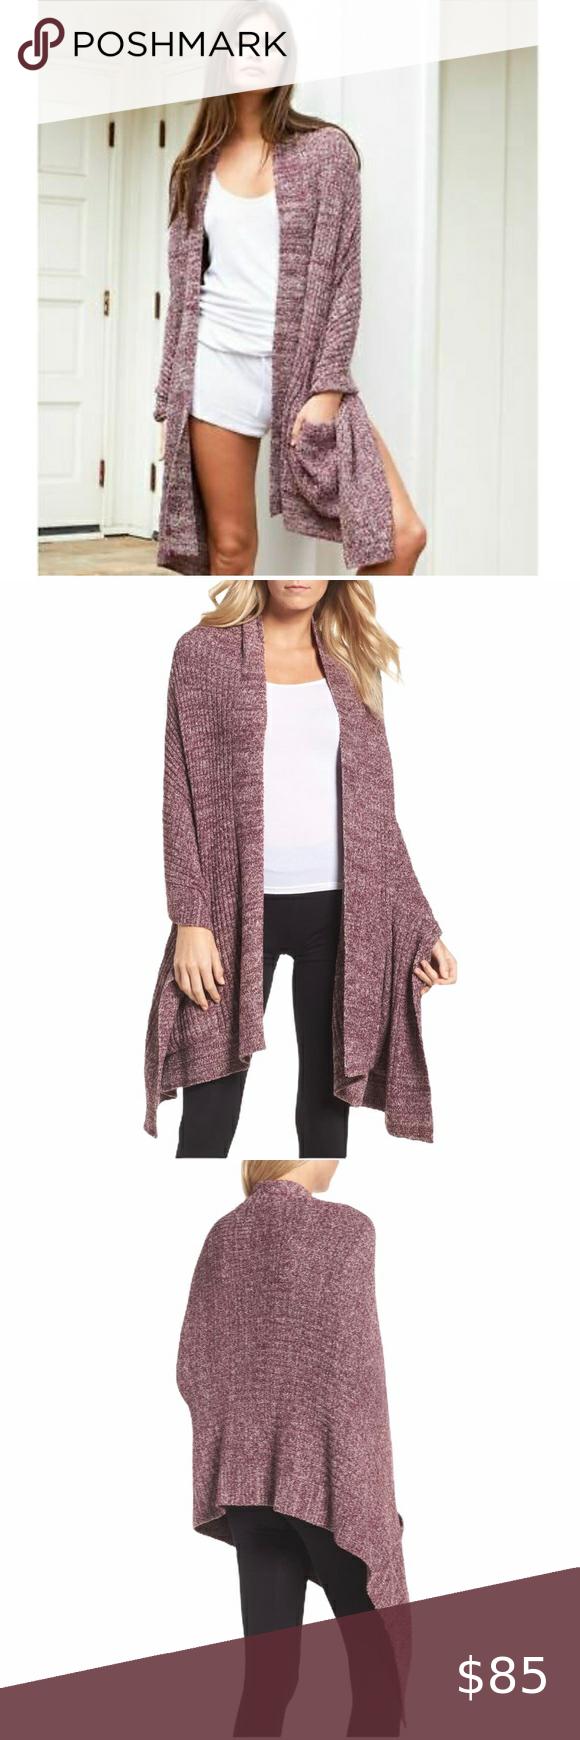 12+ Travel shawl with pockets ideas